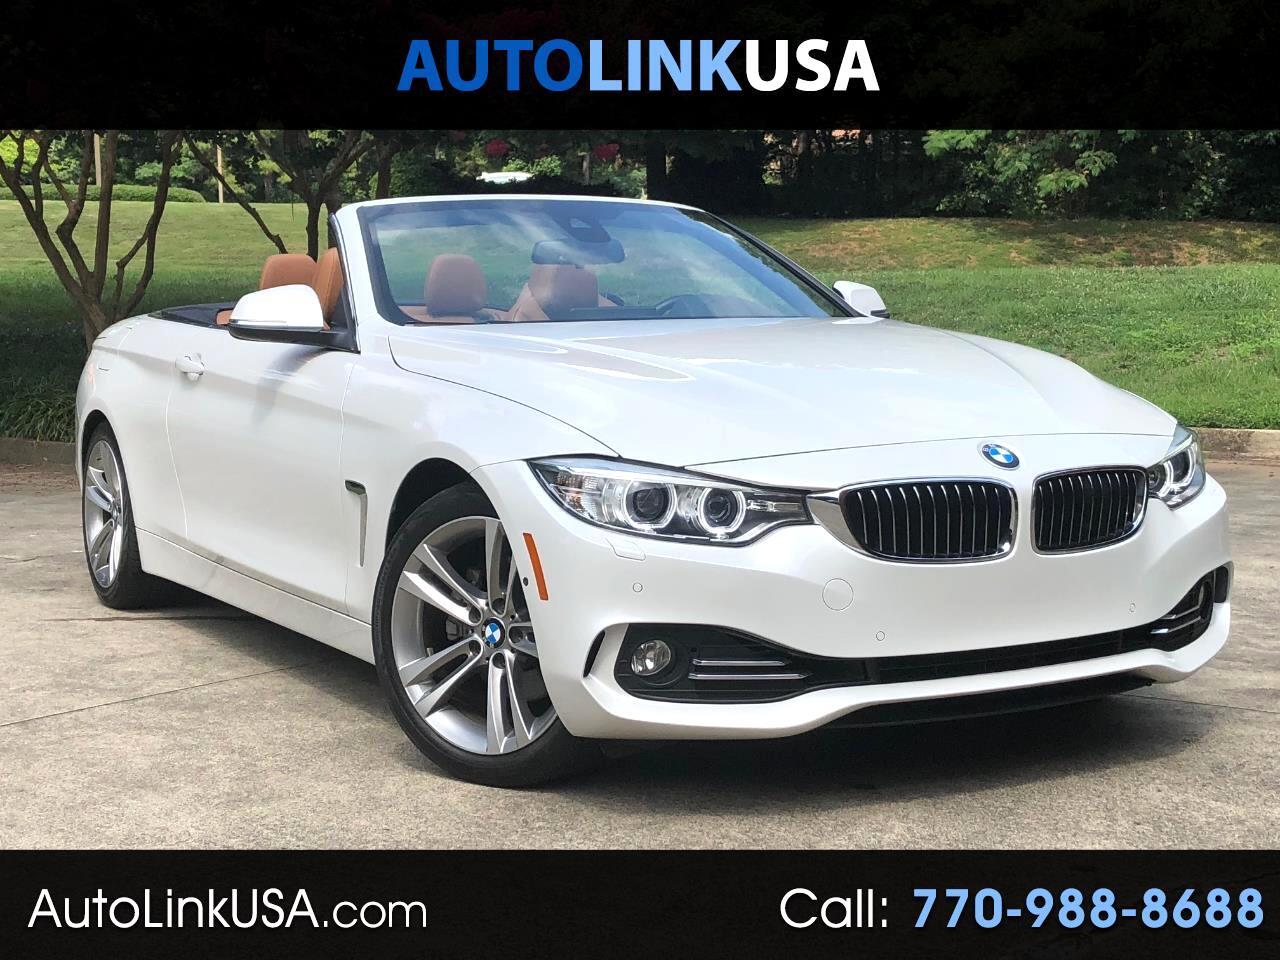 2017 BMW 4-Series 430I Luxury Convertible